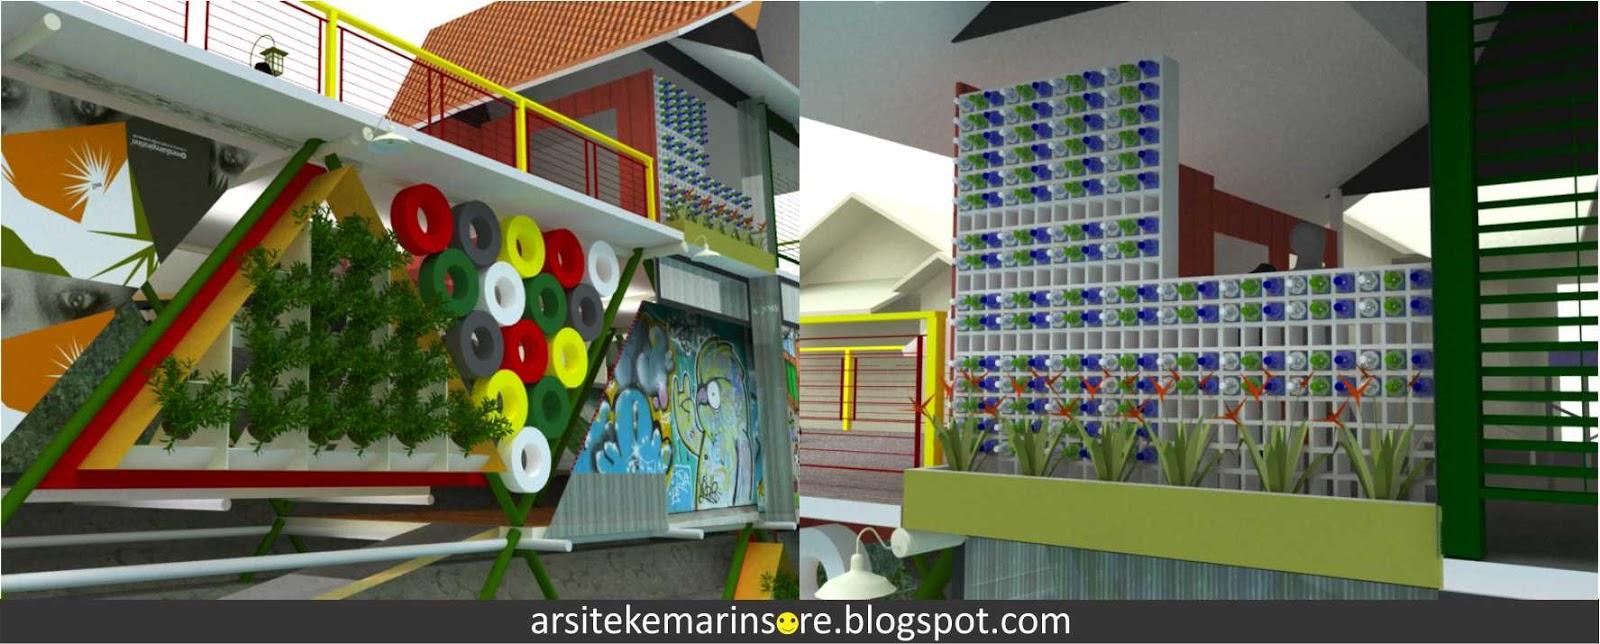 Arsitekemarinsore Ruang Publik Vertikal Kali Code